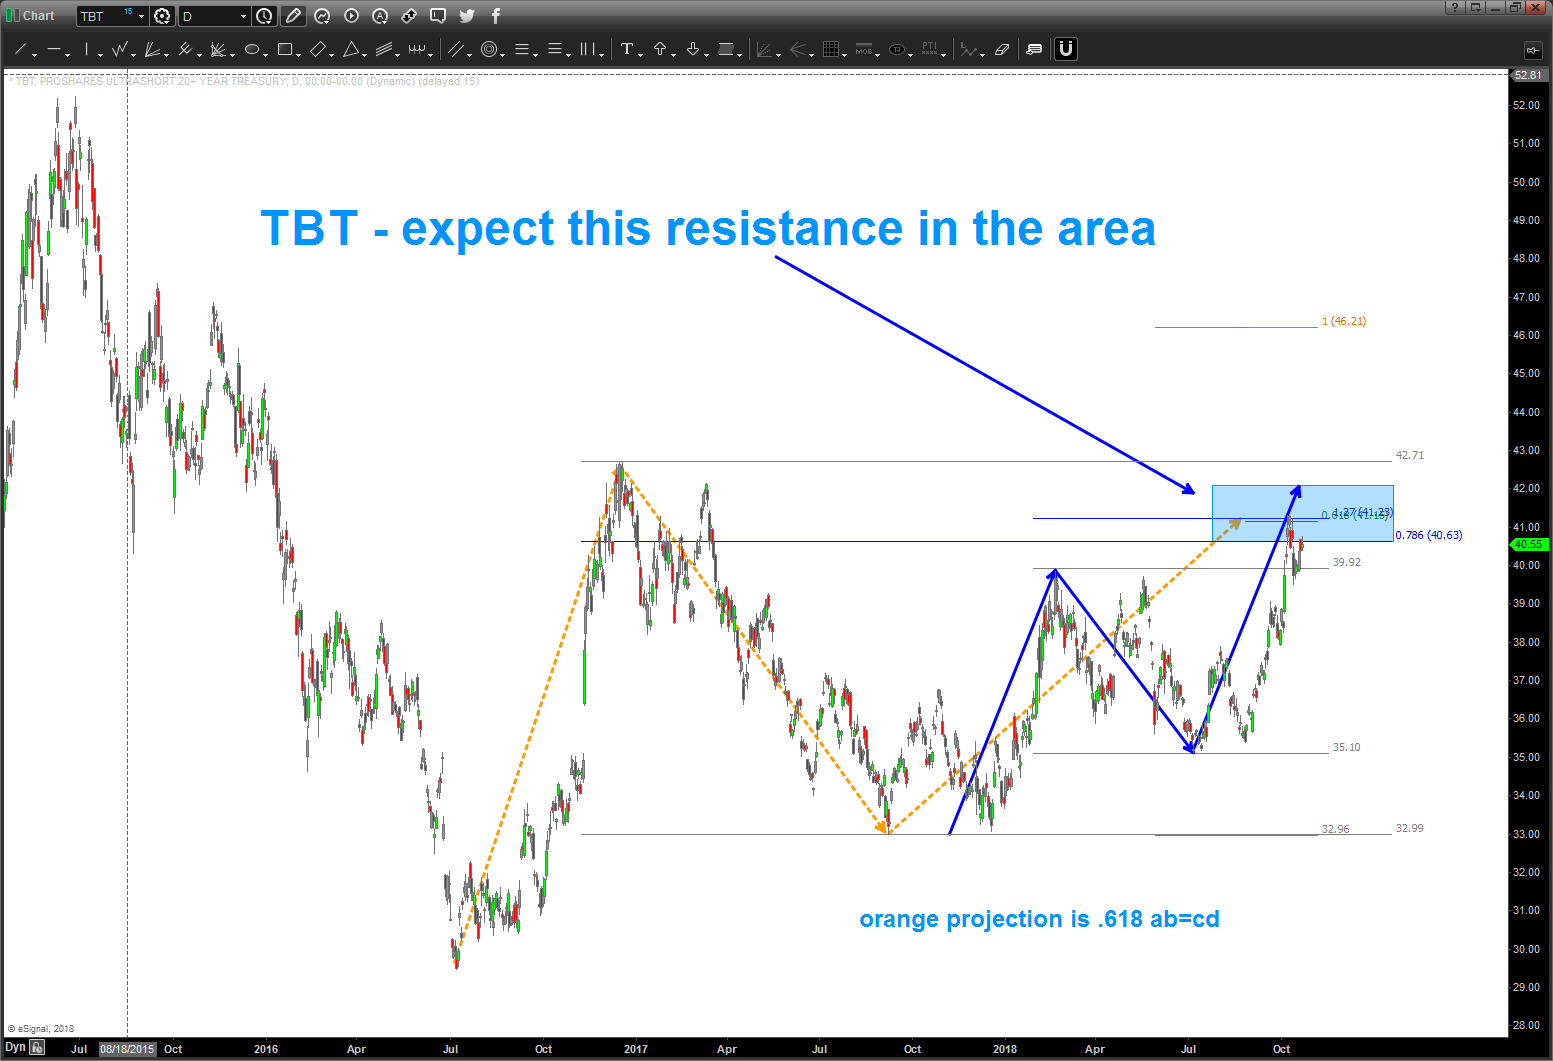 tbt short treasury bonds etf trading price resistance target october 22